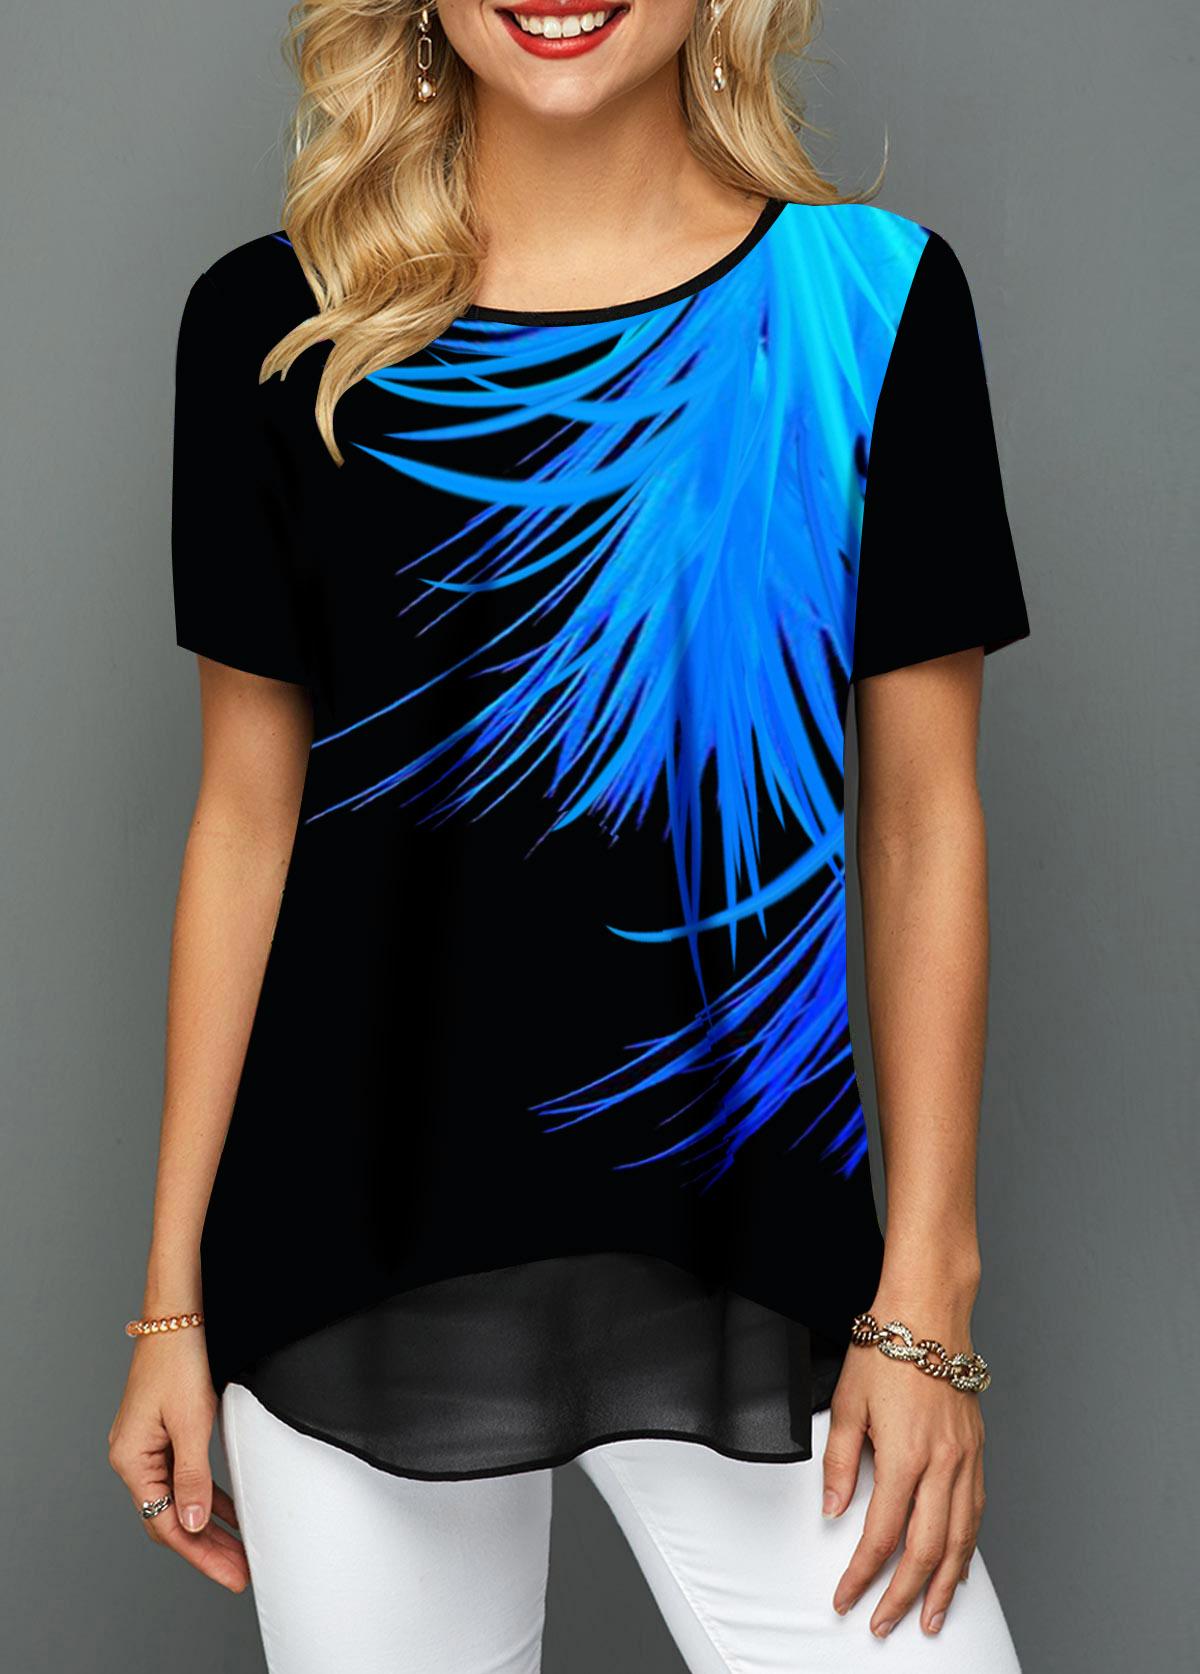 Printed Round Neck Short Sleeve T Shirt